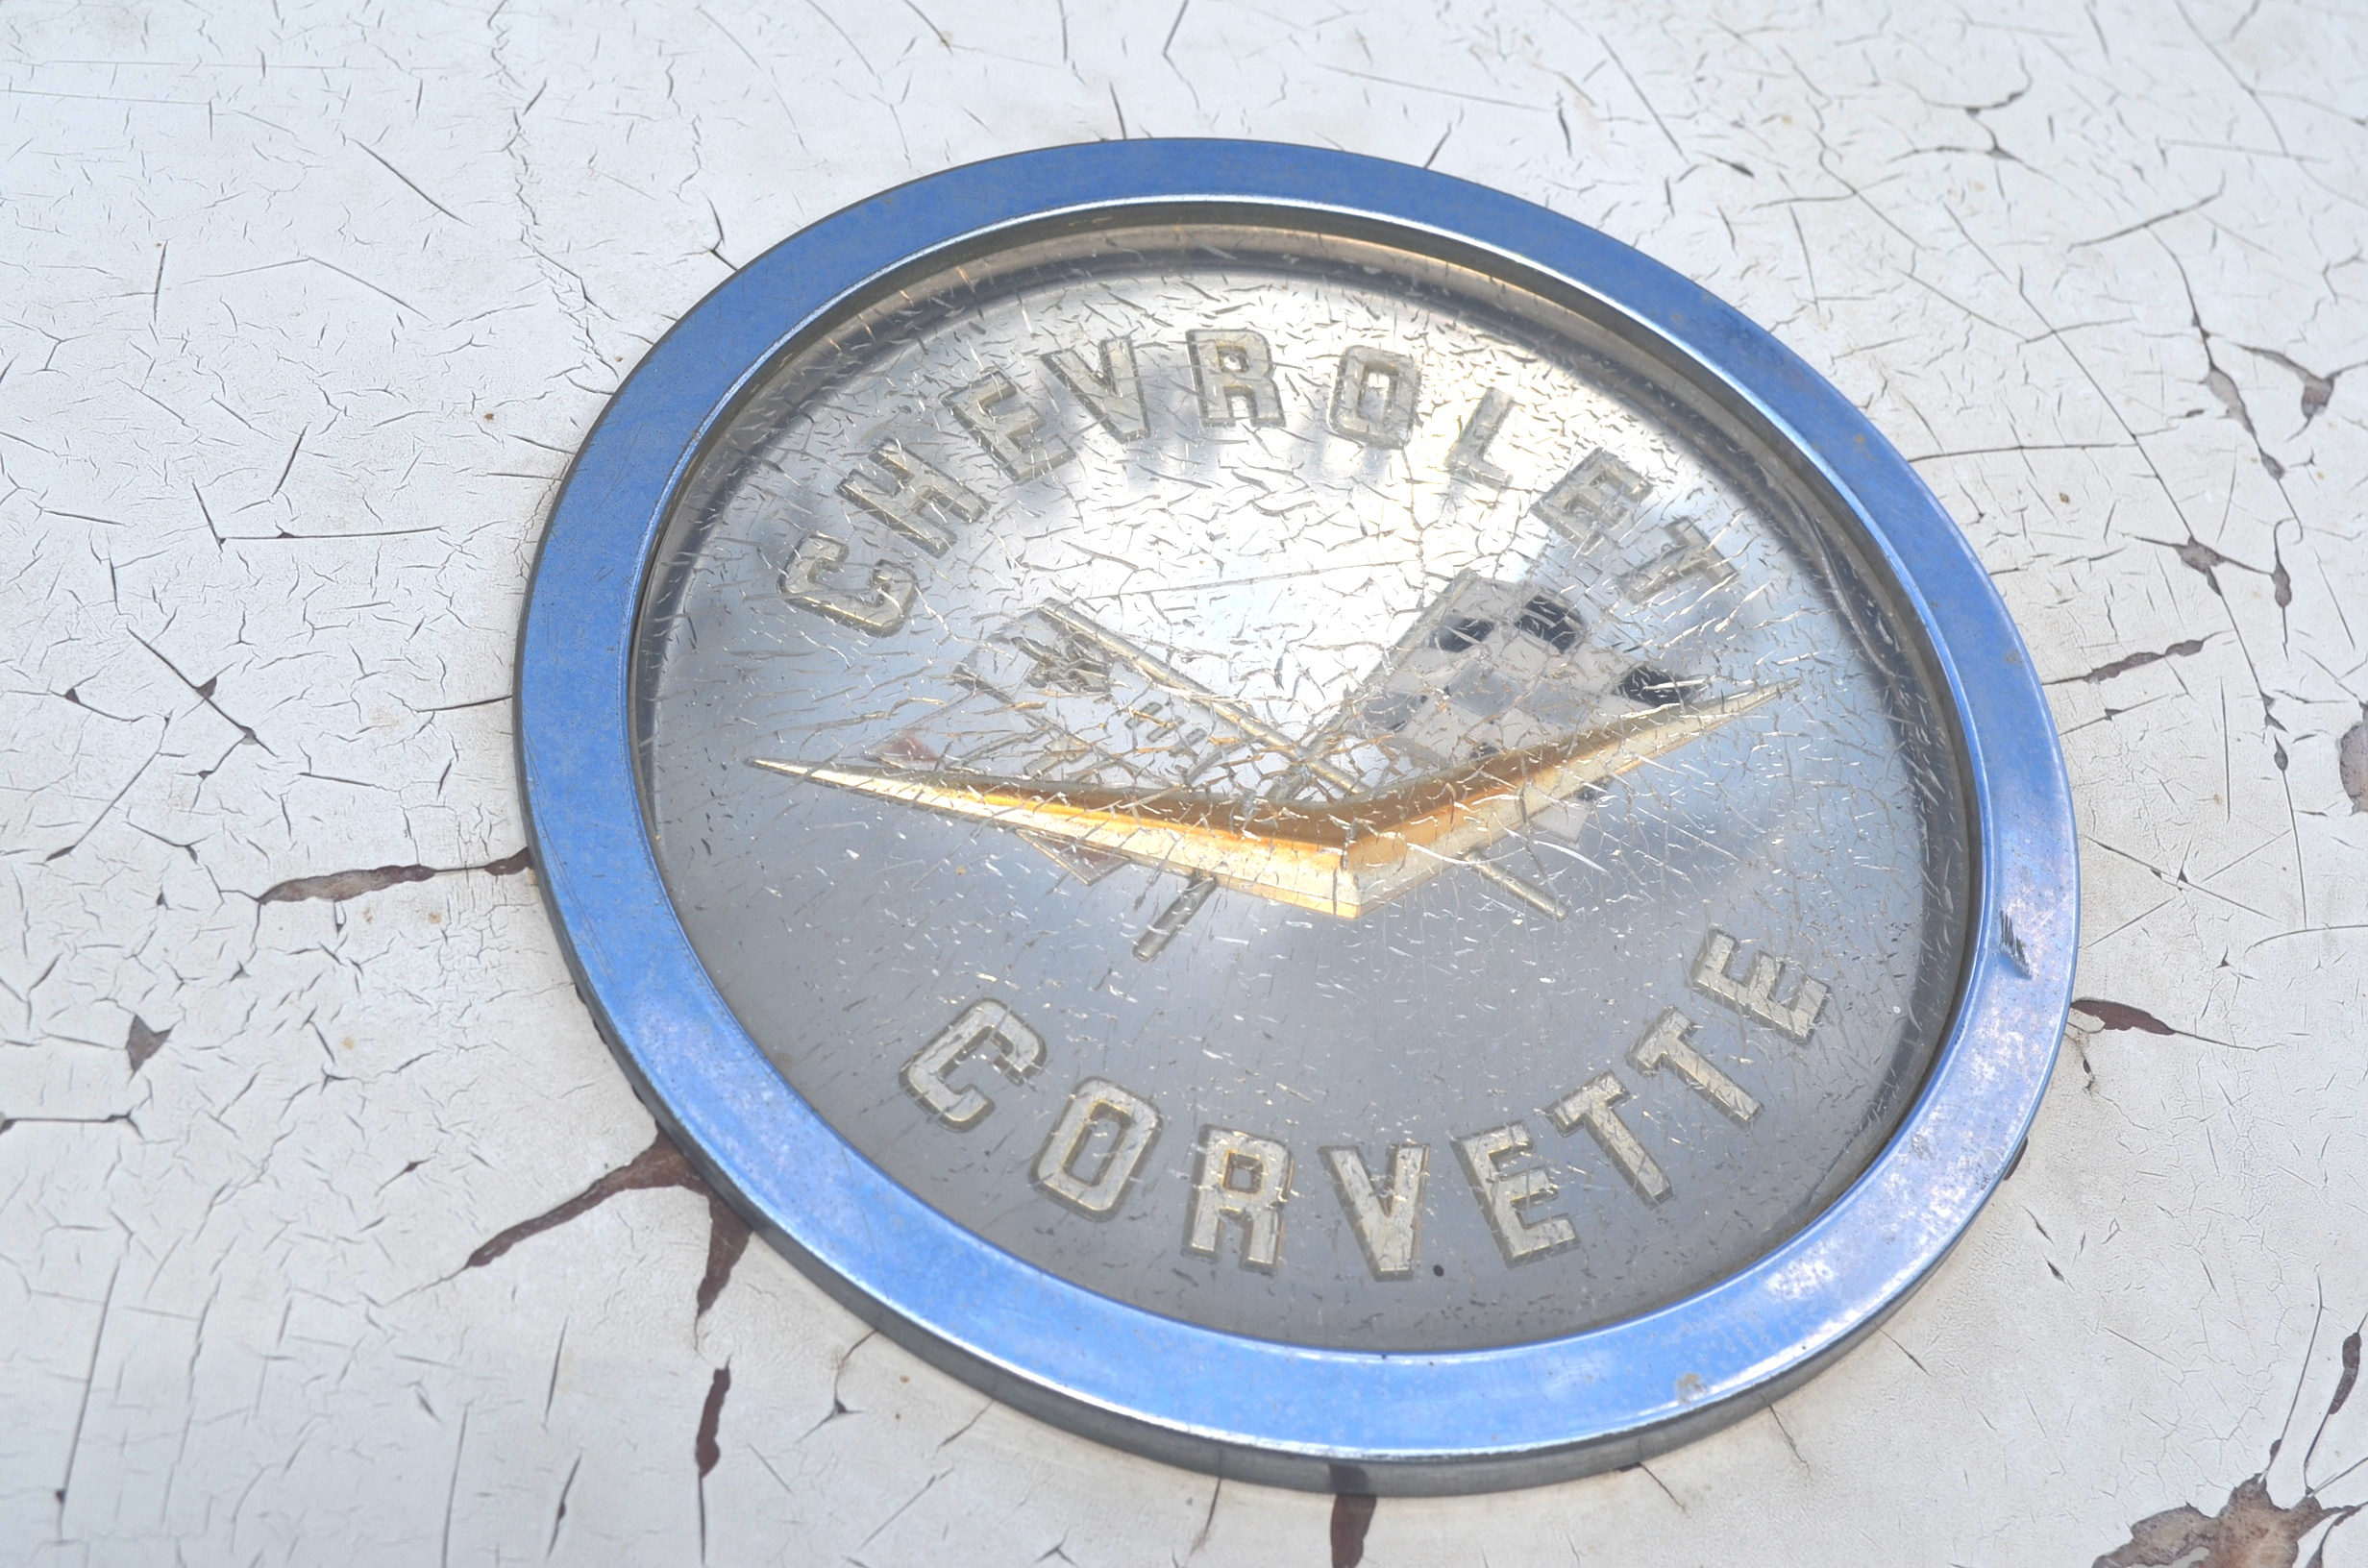 Corvette_emblem